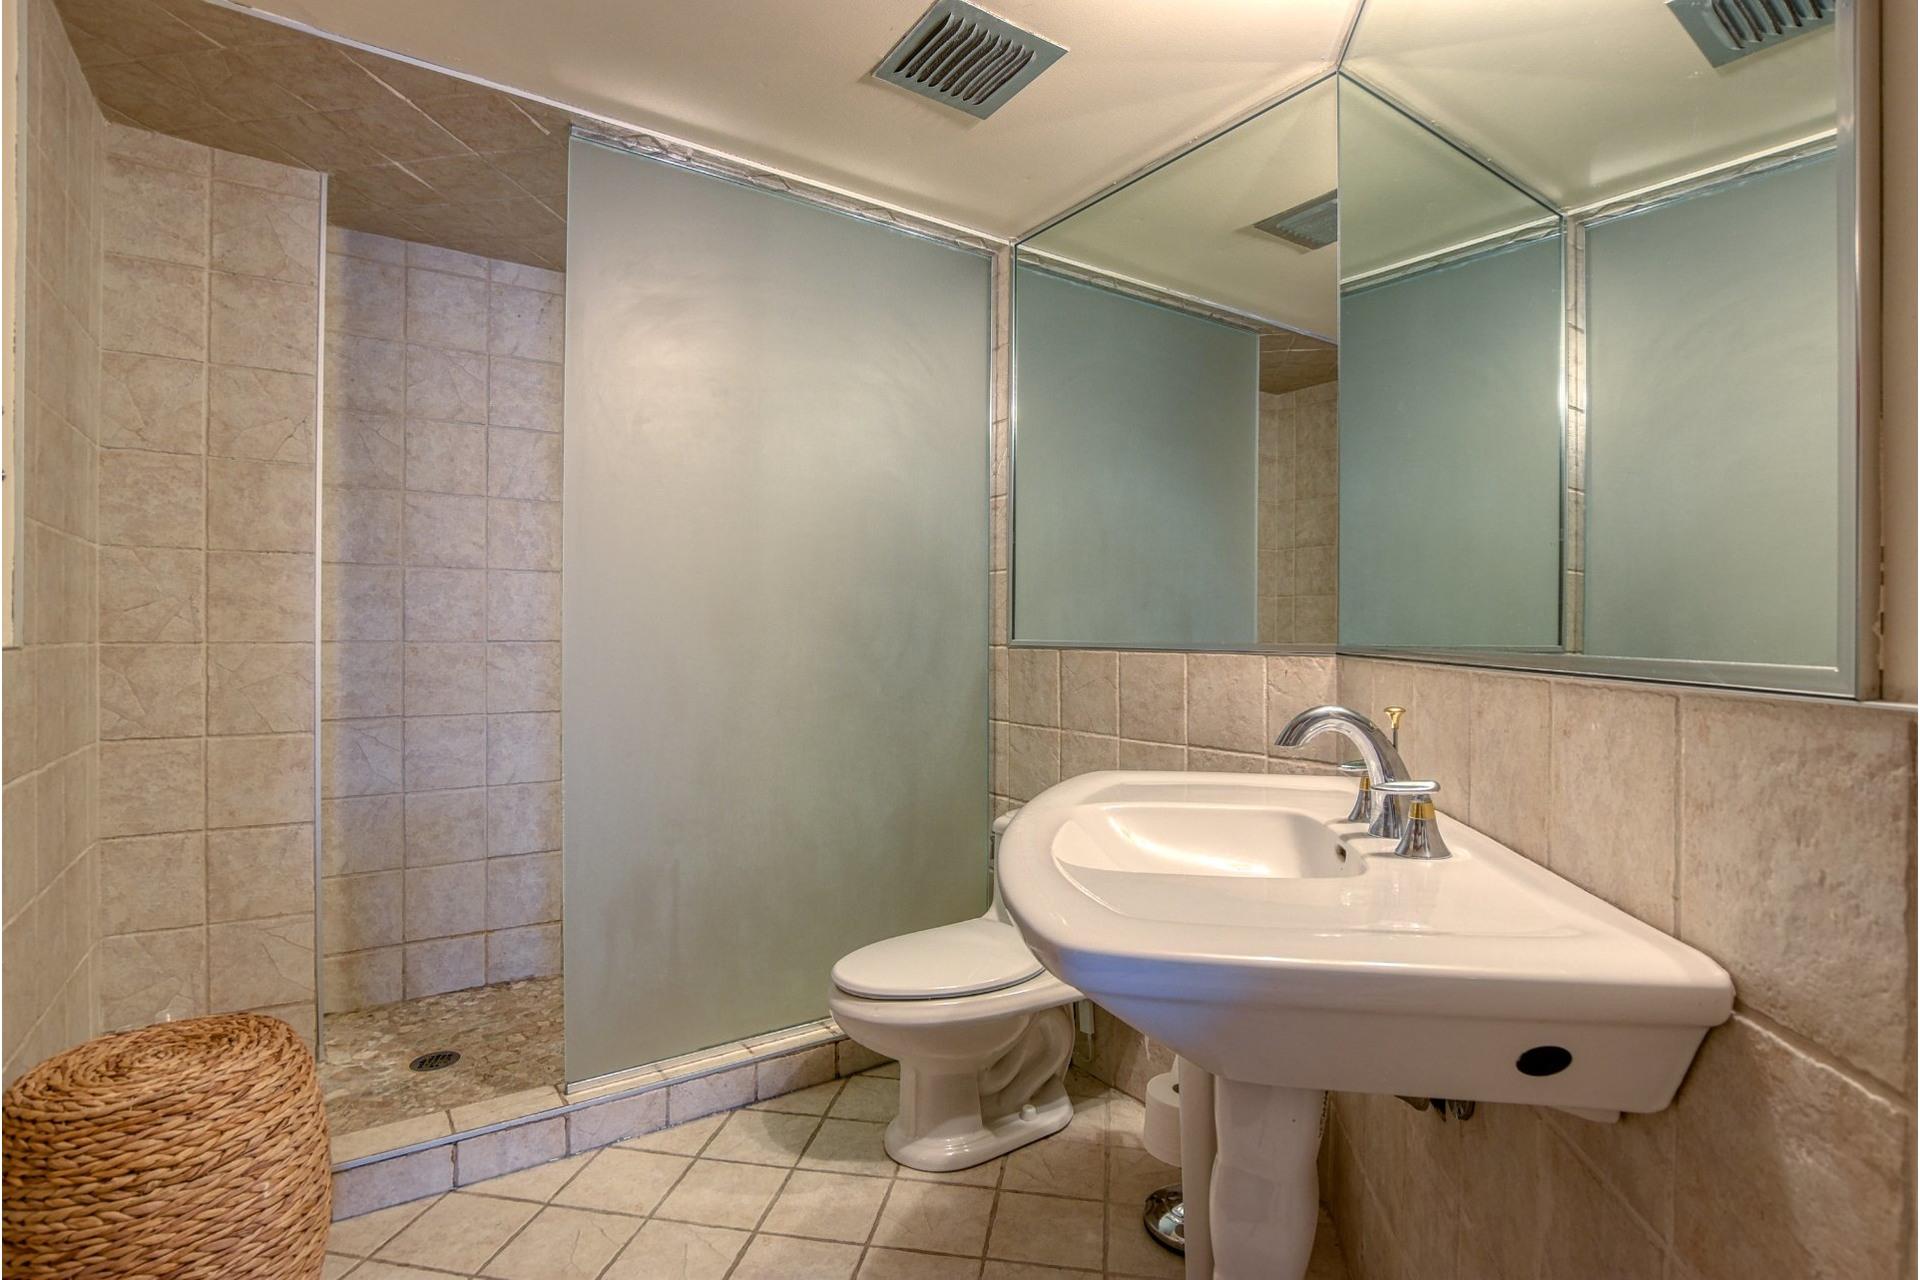 image 16 - Apartment For sale Le Vieux-Longueuil Longueuil  - 6 rooms